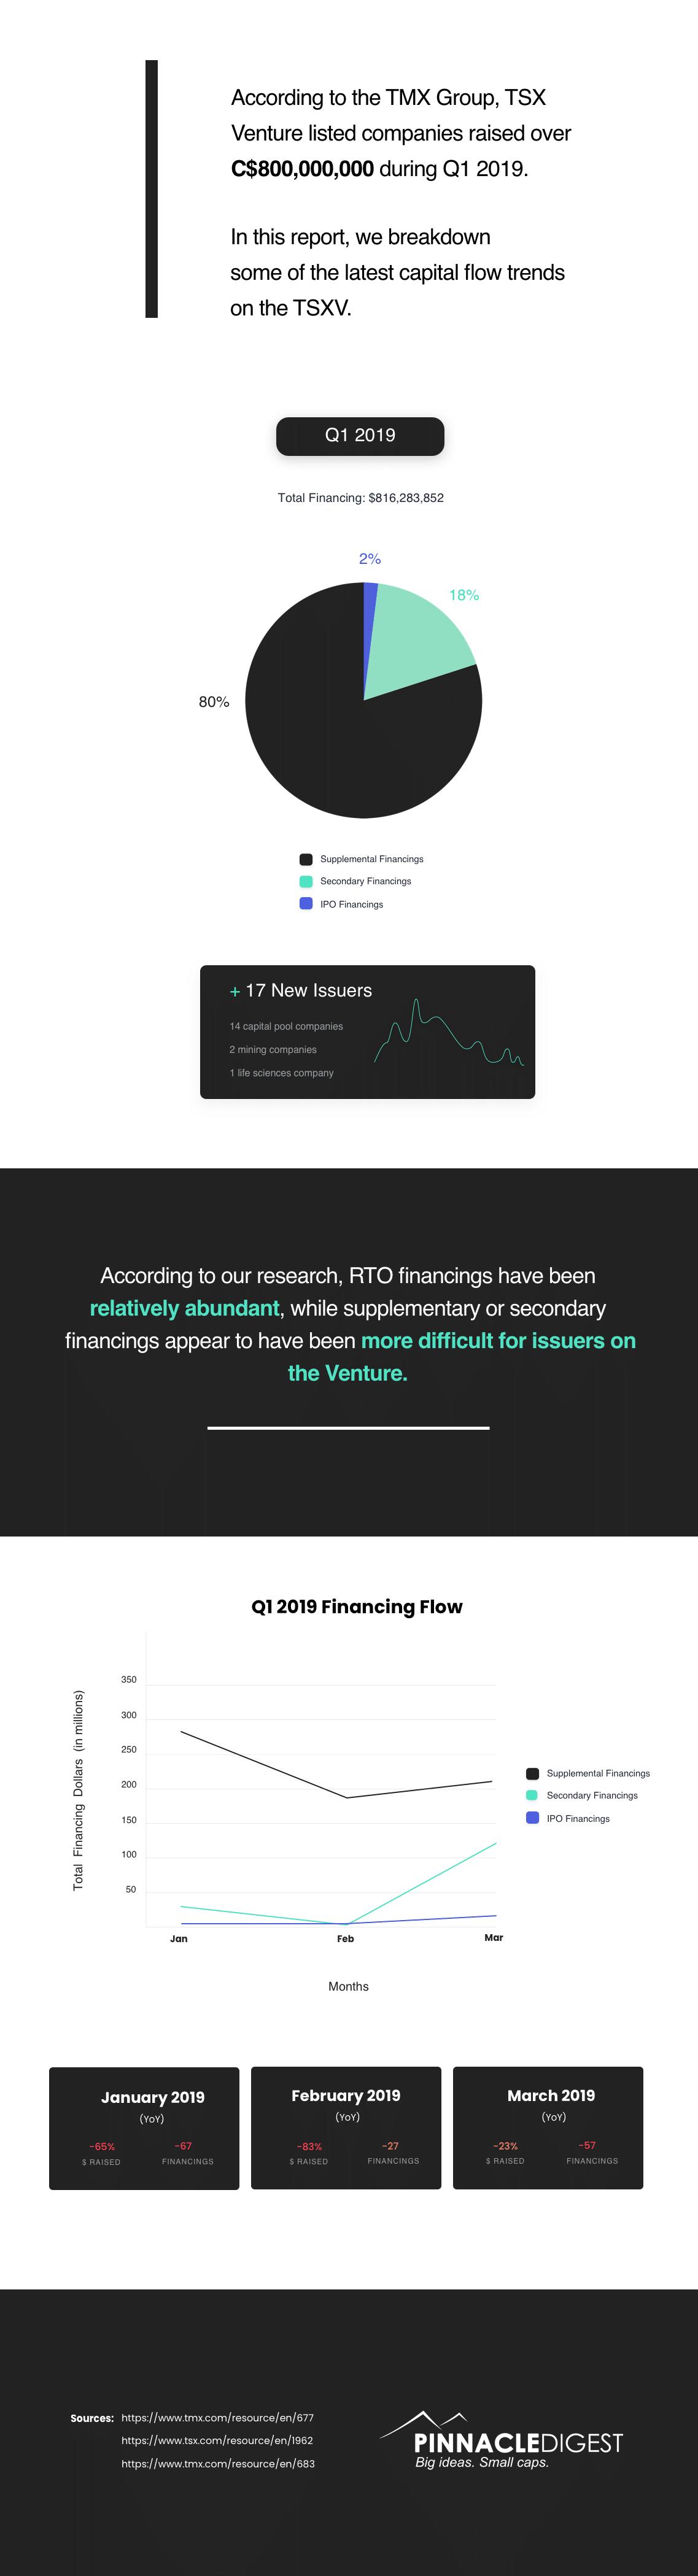 TSX Venture financing statistics for Q1 2019